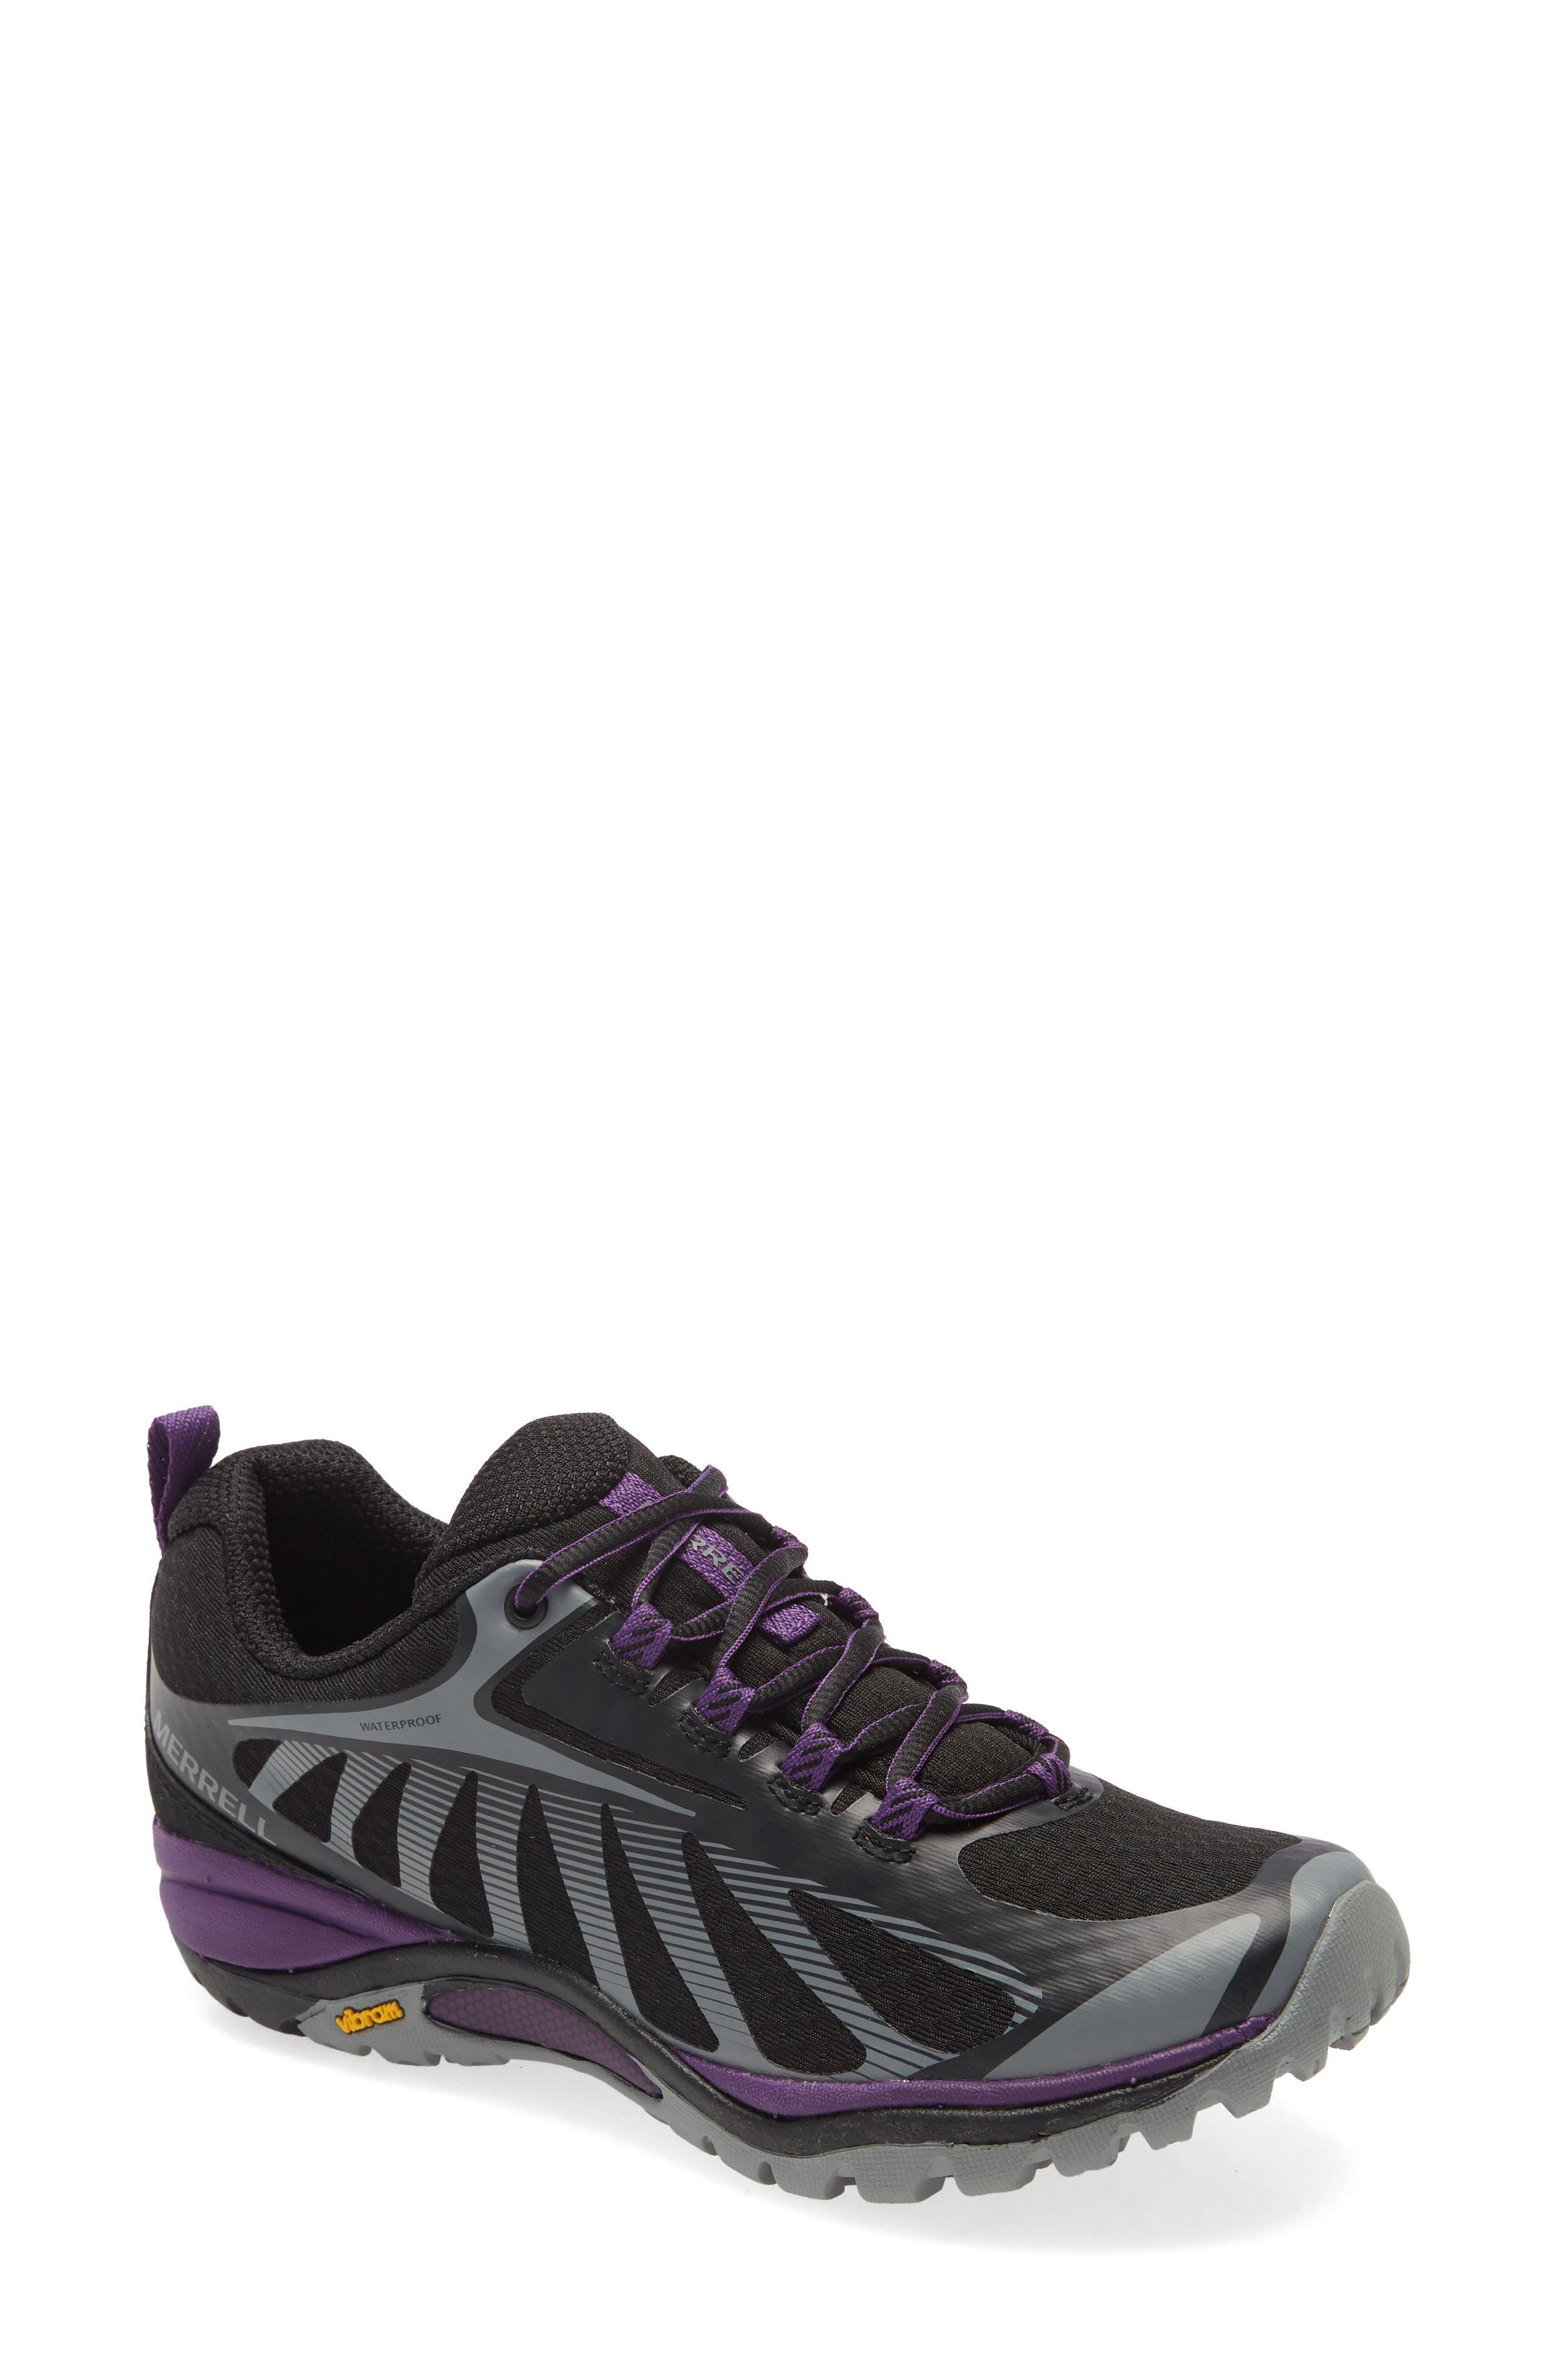 Siren Edge 3 Waterproof Sneaker